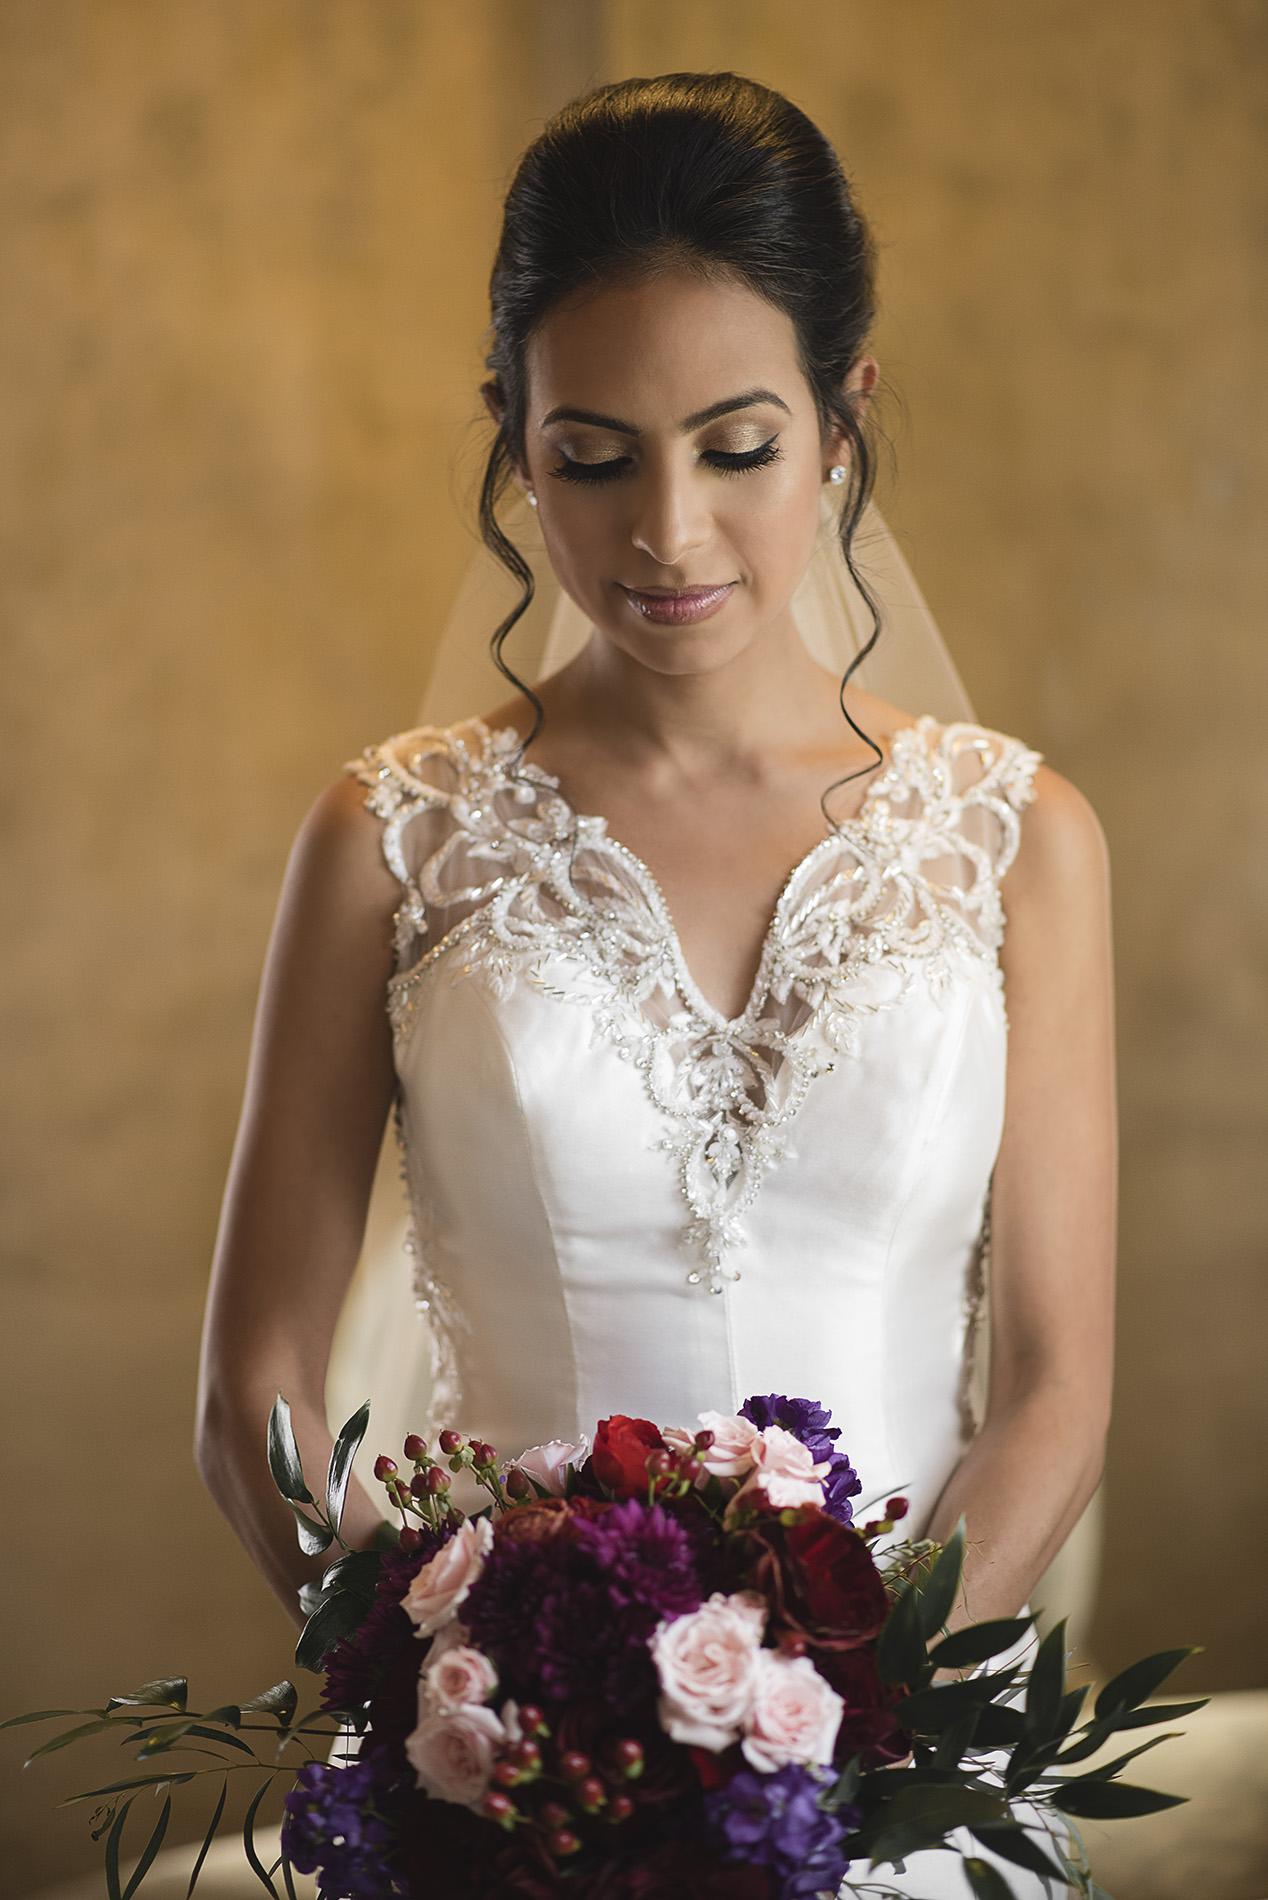 Houston-venue-Olde-Dobbin-Station-Romantic-Classic-Wedding-Photographer-023.jpg